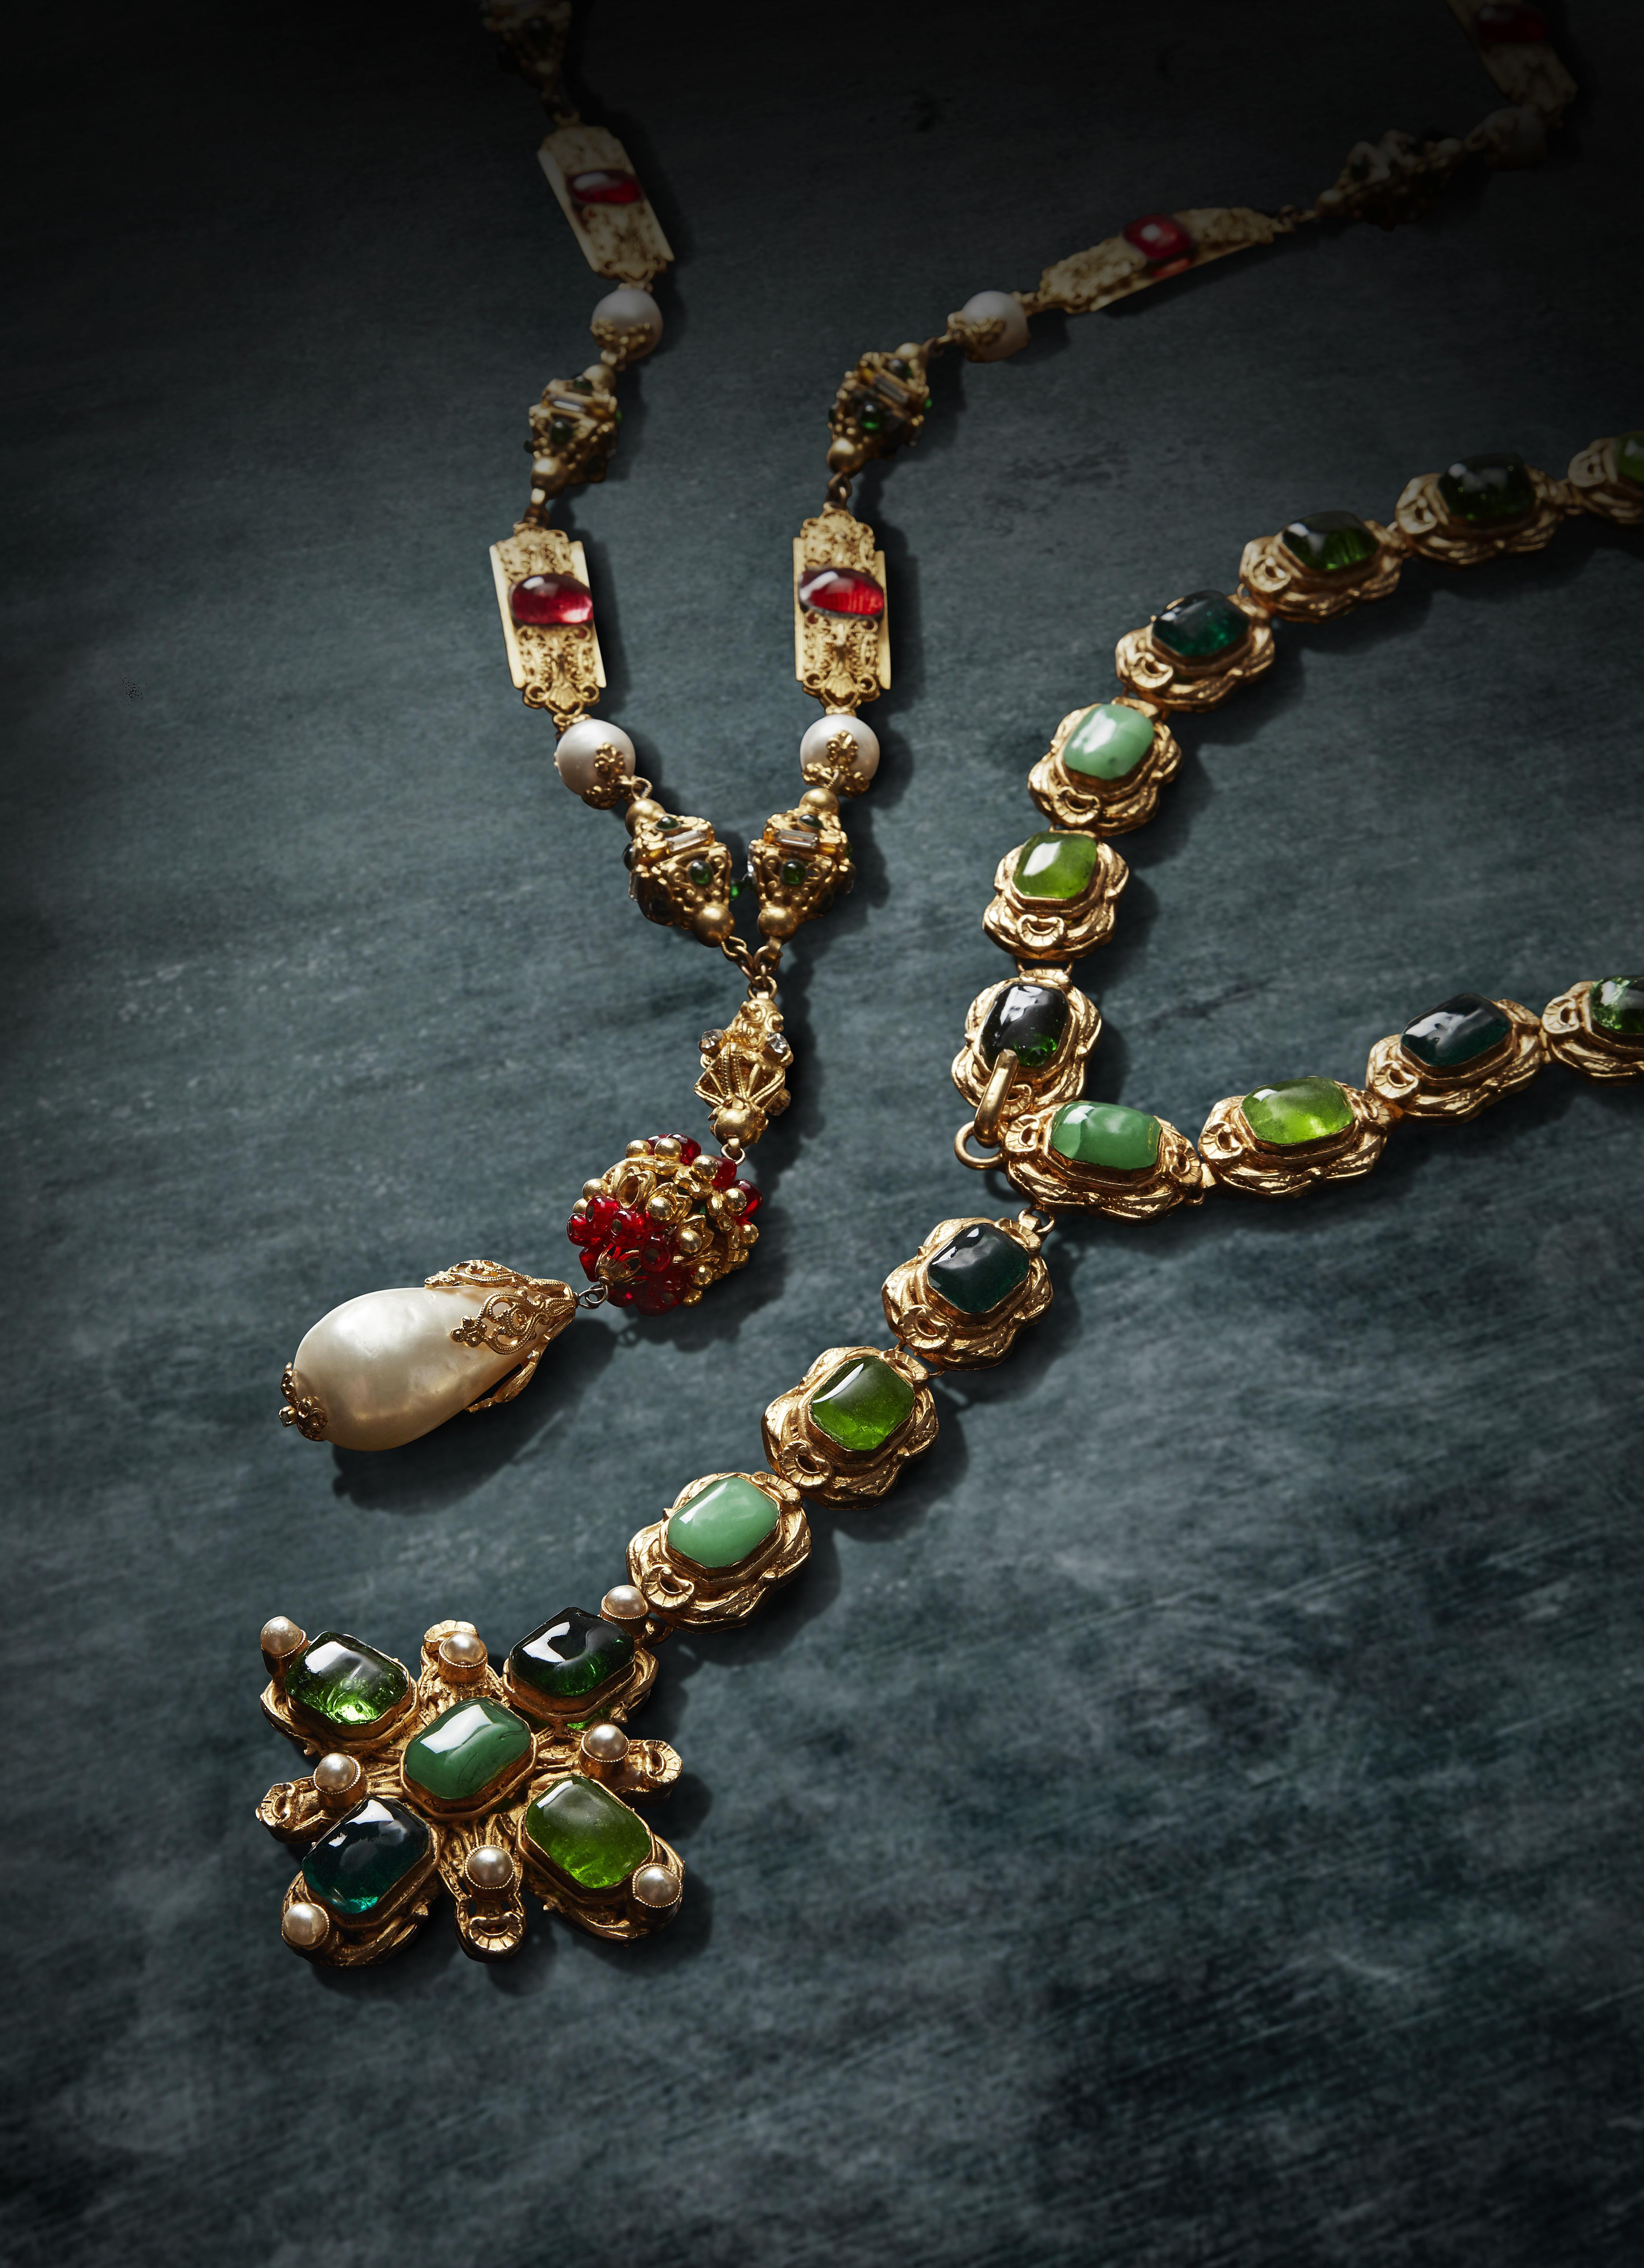 Vintage Chanel Jewellery And Handbags Form Part Of 'nobel Pertaining To Akash Industrial Vintage 1 Light Geometric Pendants (Image 27 of 30)